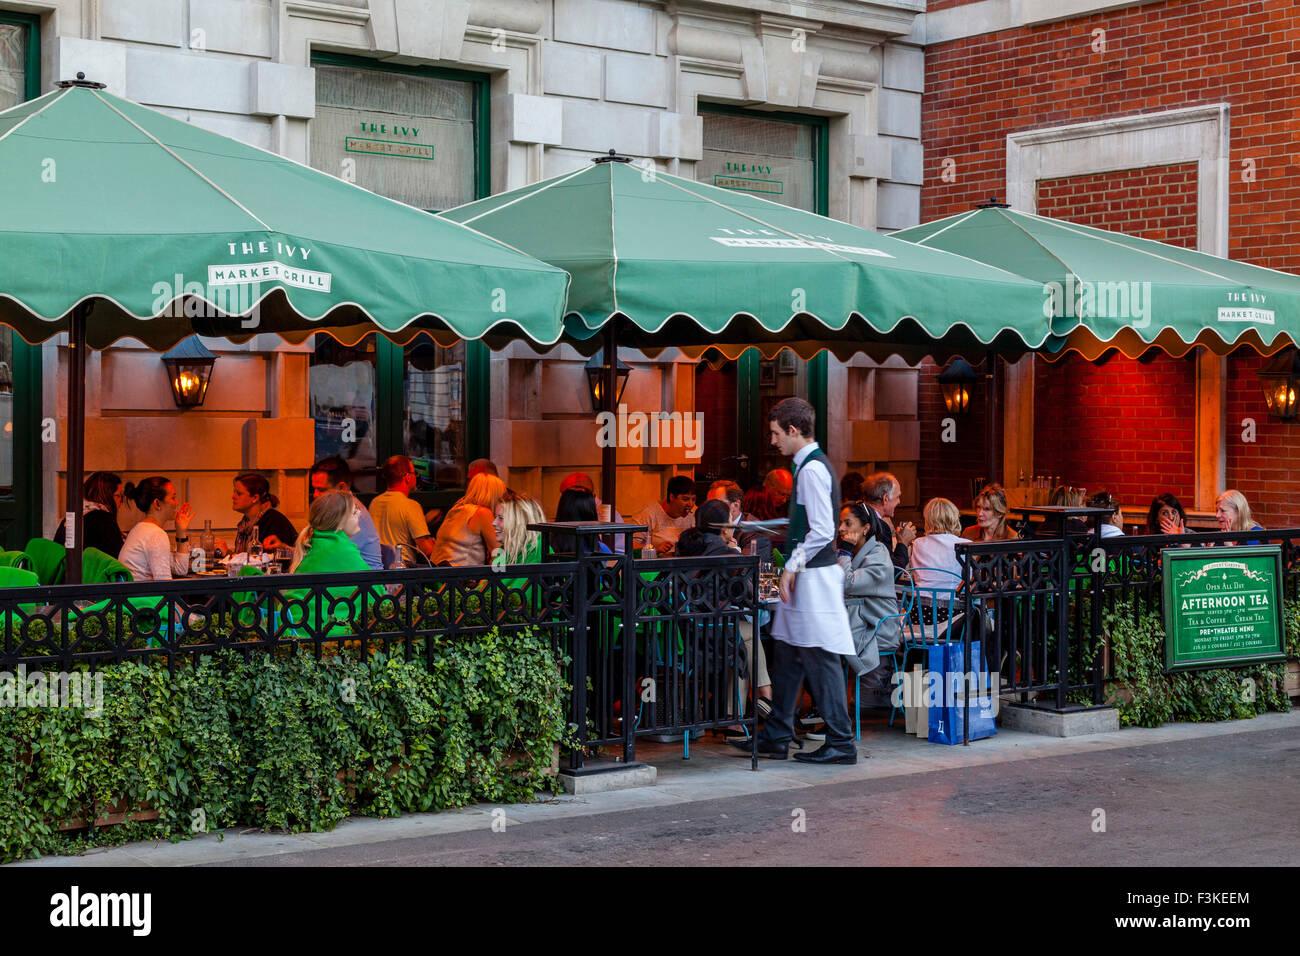 The Ivy Market Grill Restaurant Covent Garden London Uk Stock Photo Alamy